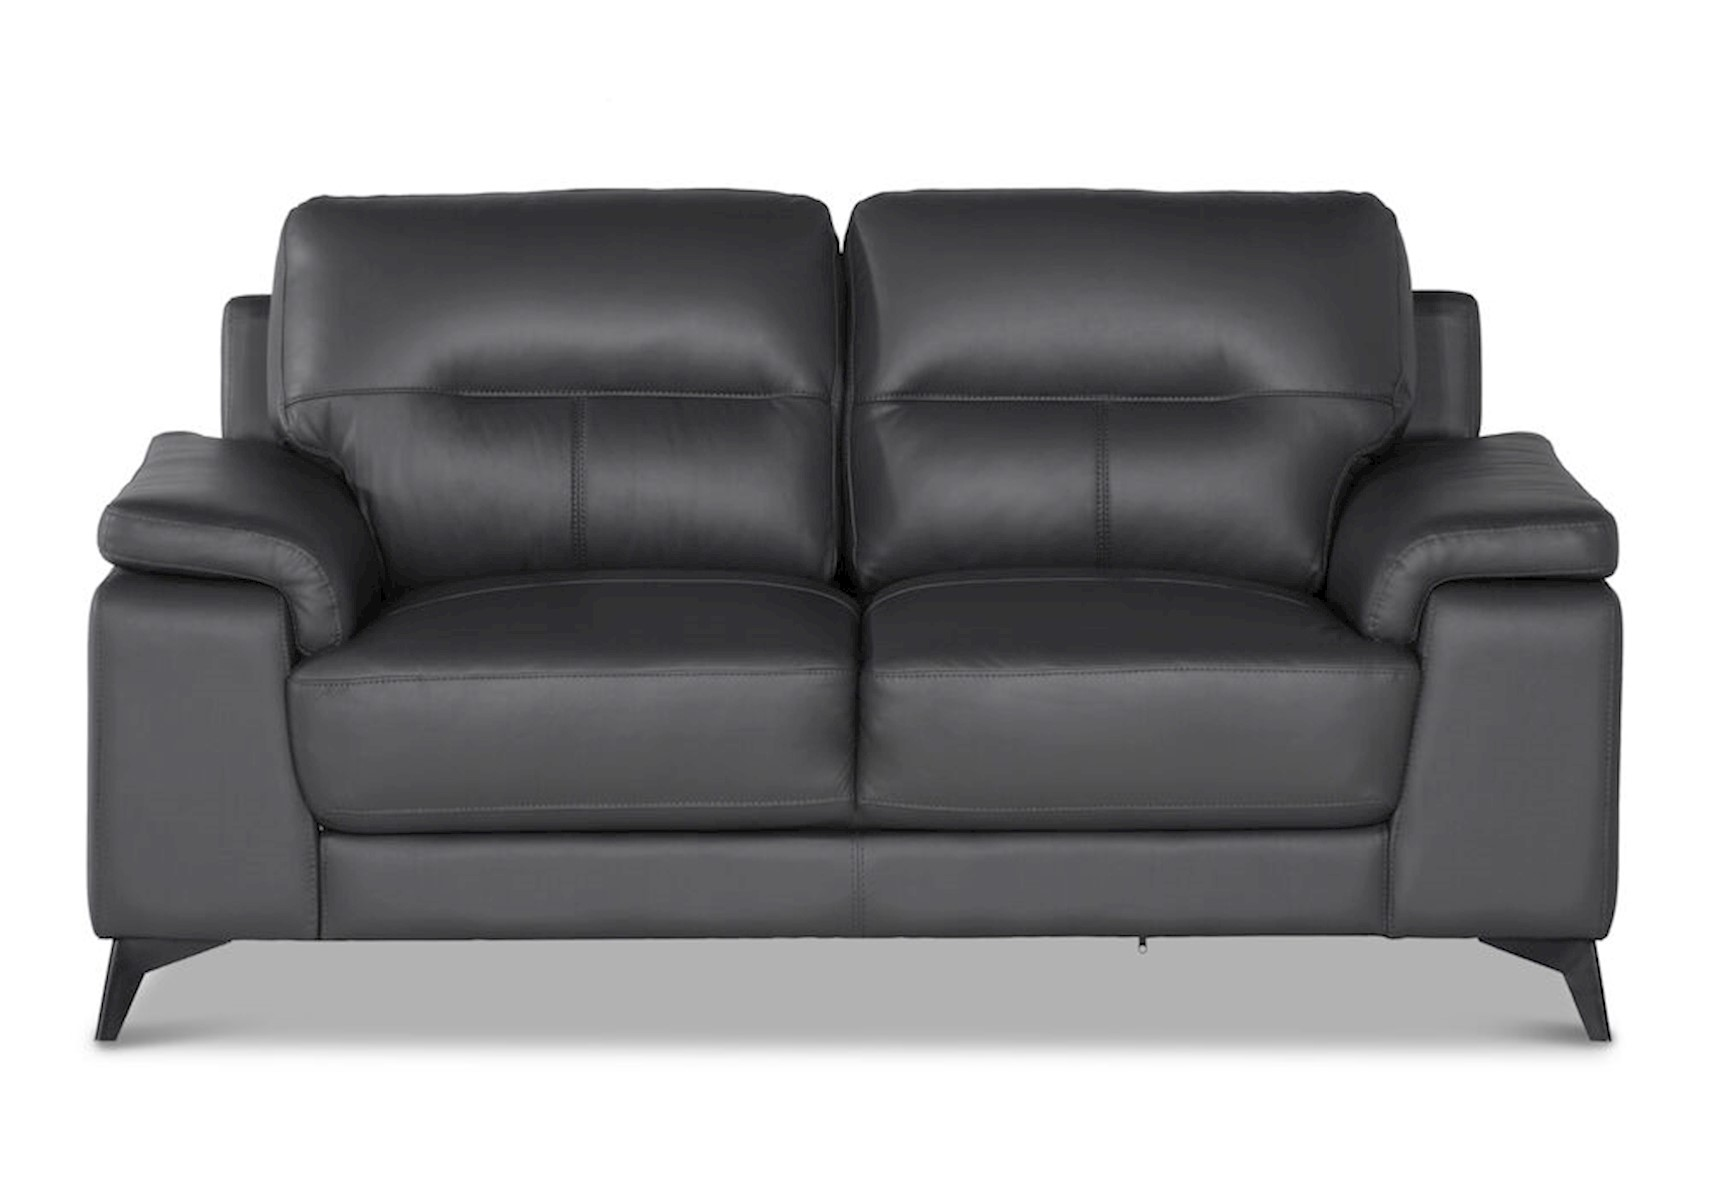 Picture of: Lacks Toledo Dark Gray Leather Loveseat